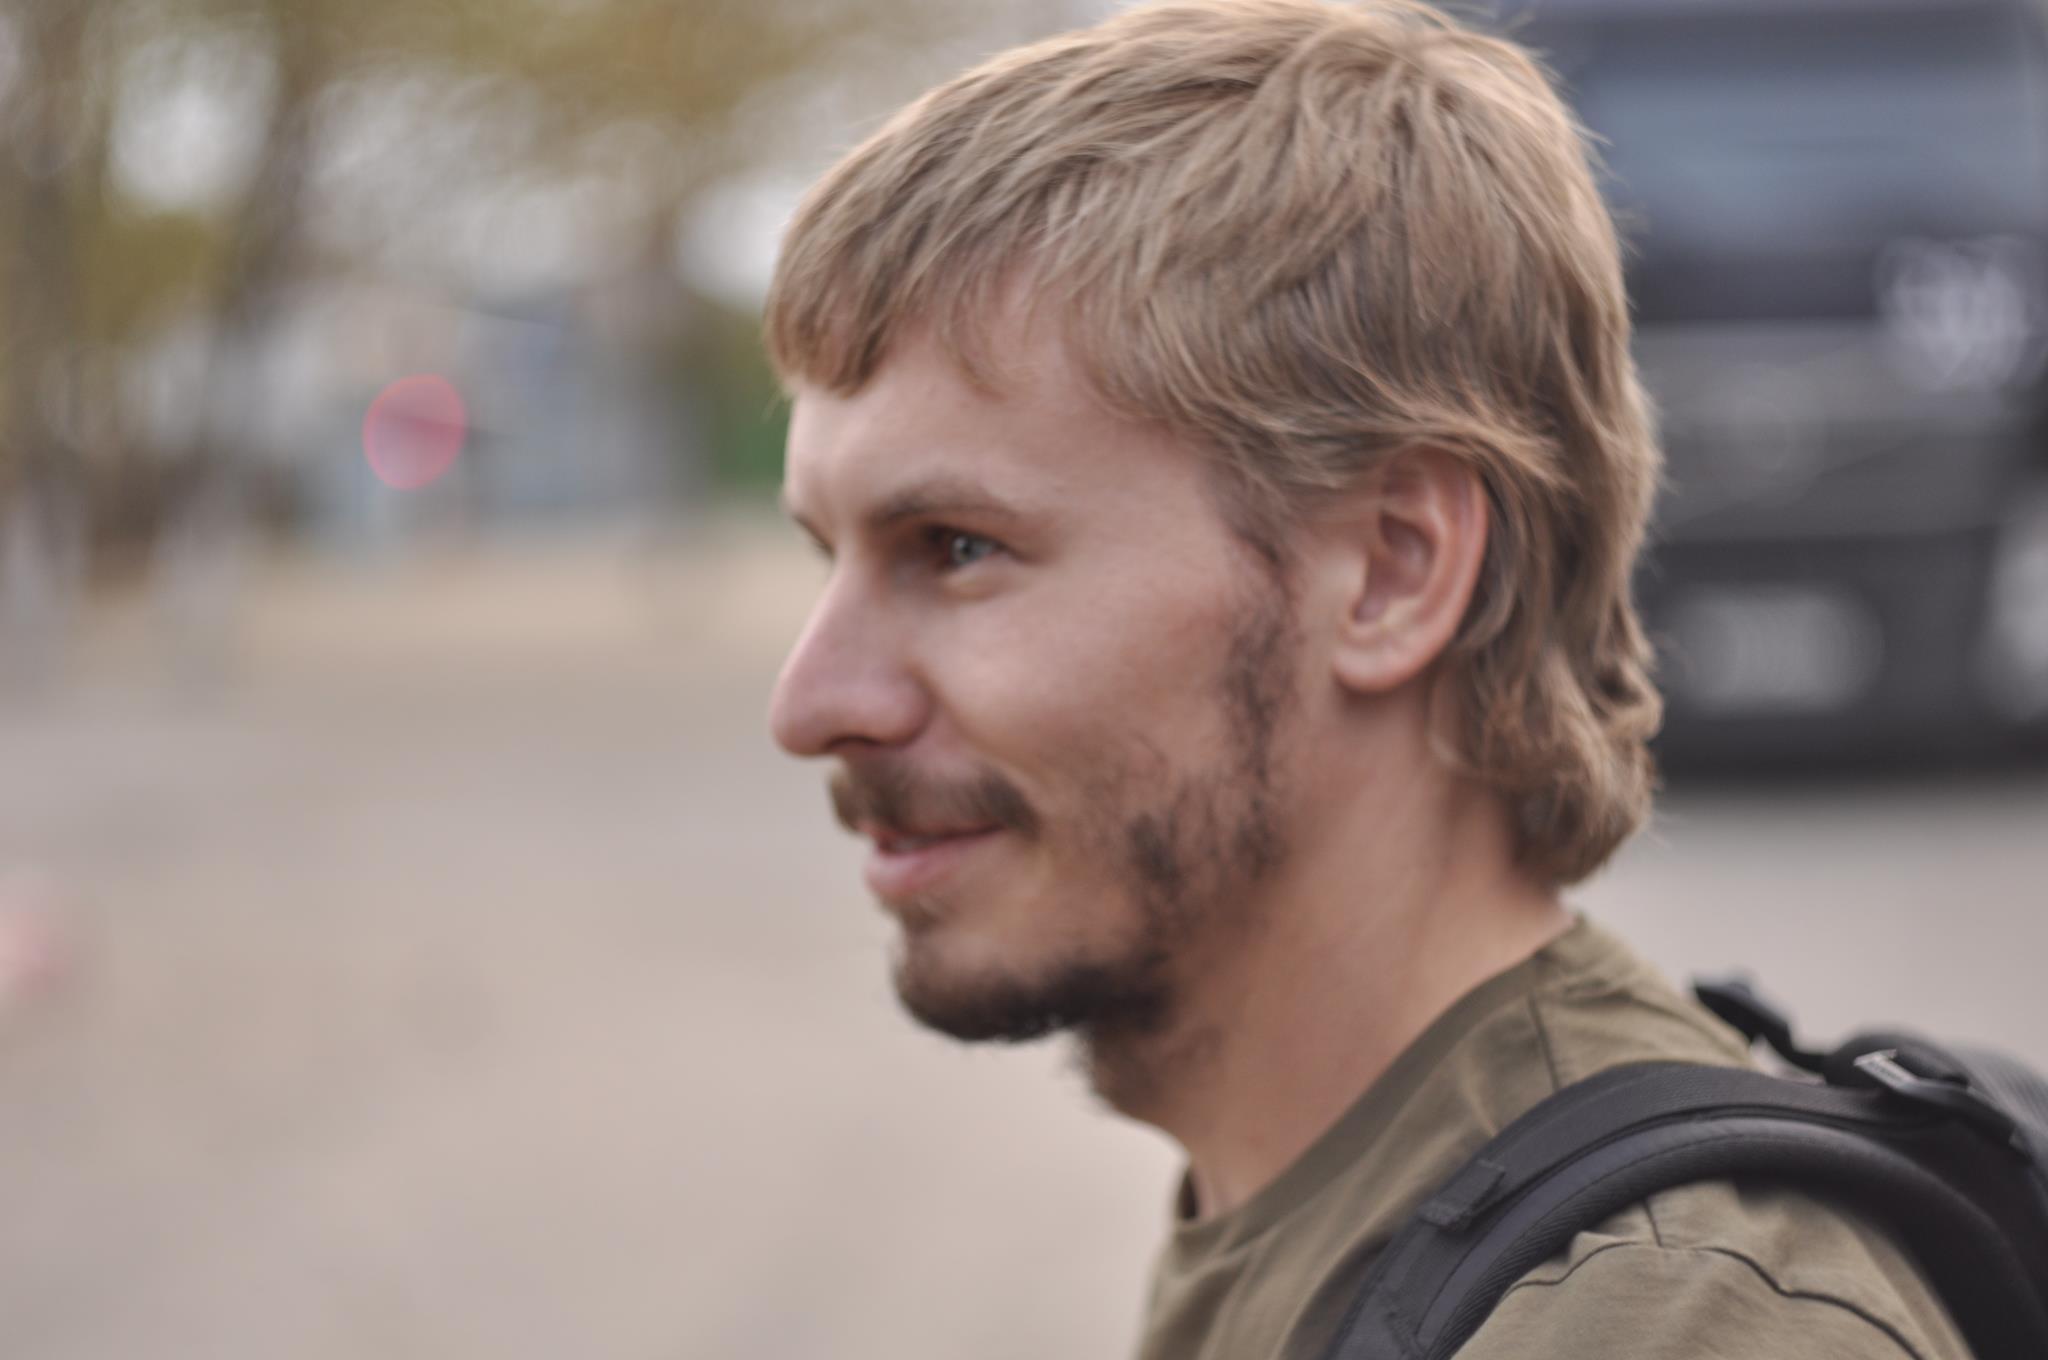 Go to Petr Andryushchenko's profile